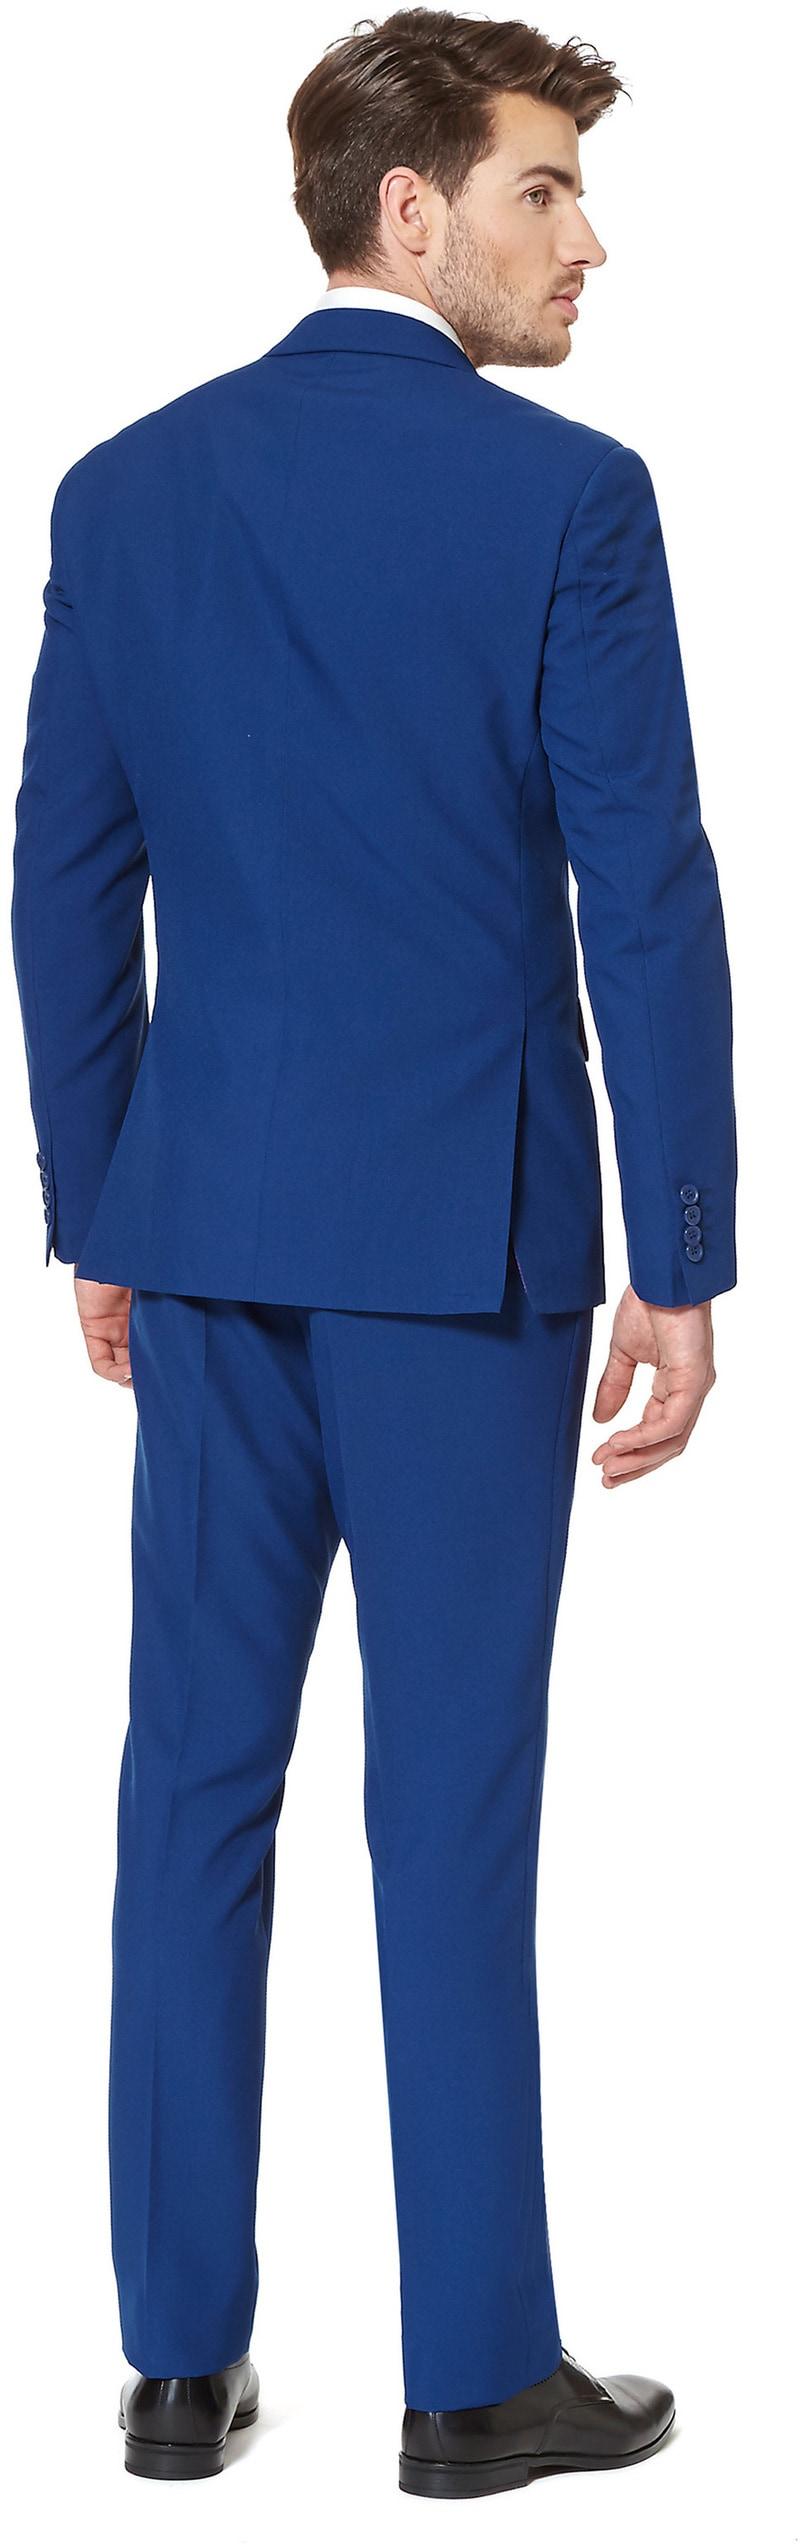 OppoSuits Navy Royale Anzug Foto 1